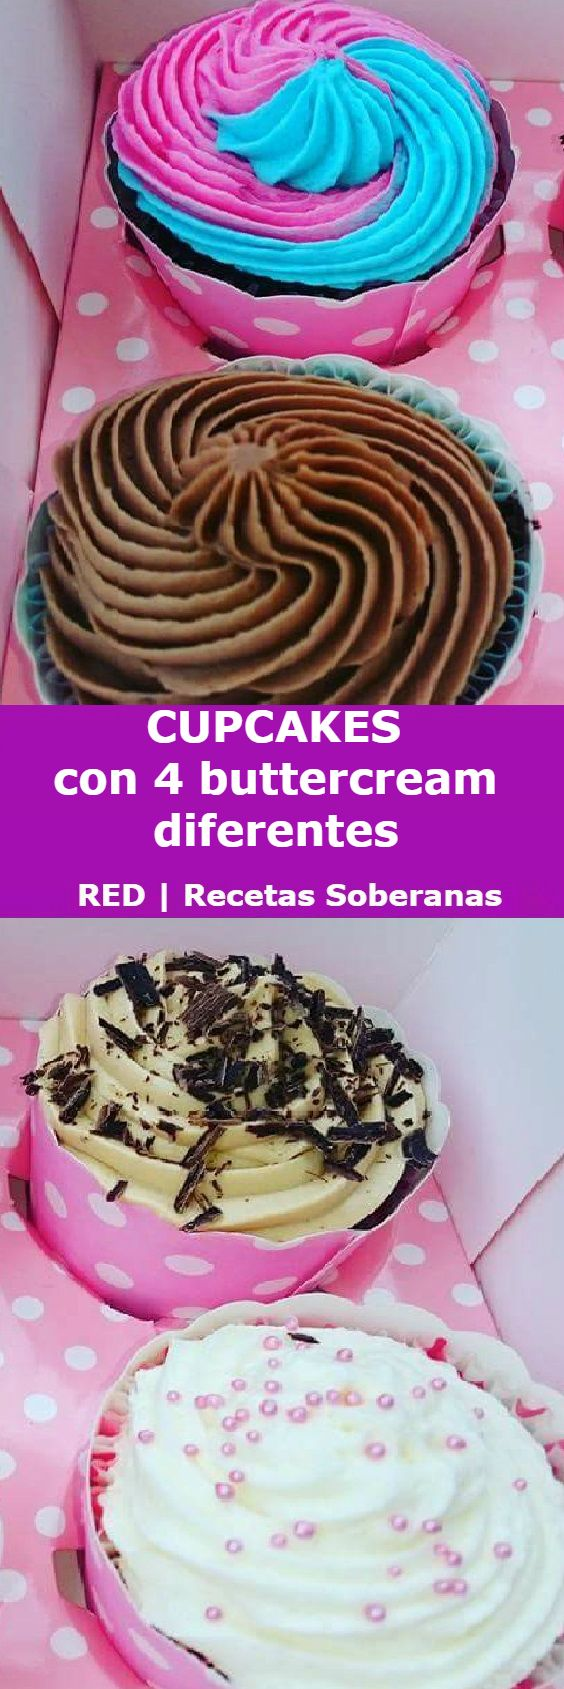 4 buttercream diferentes para cupcakes